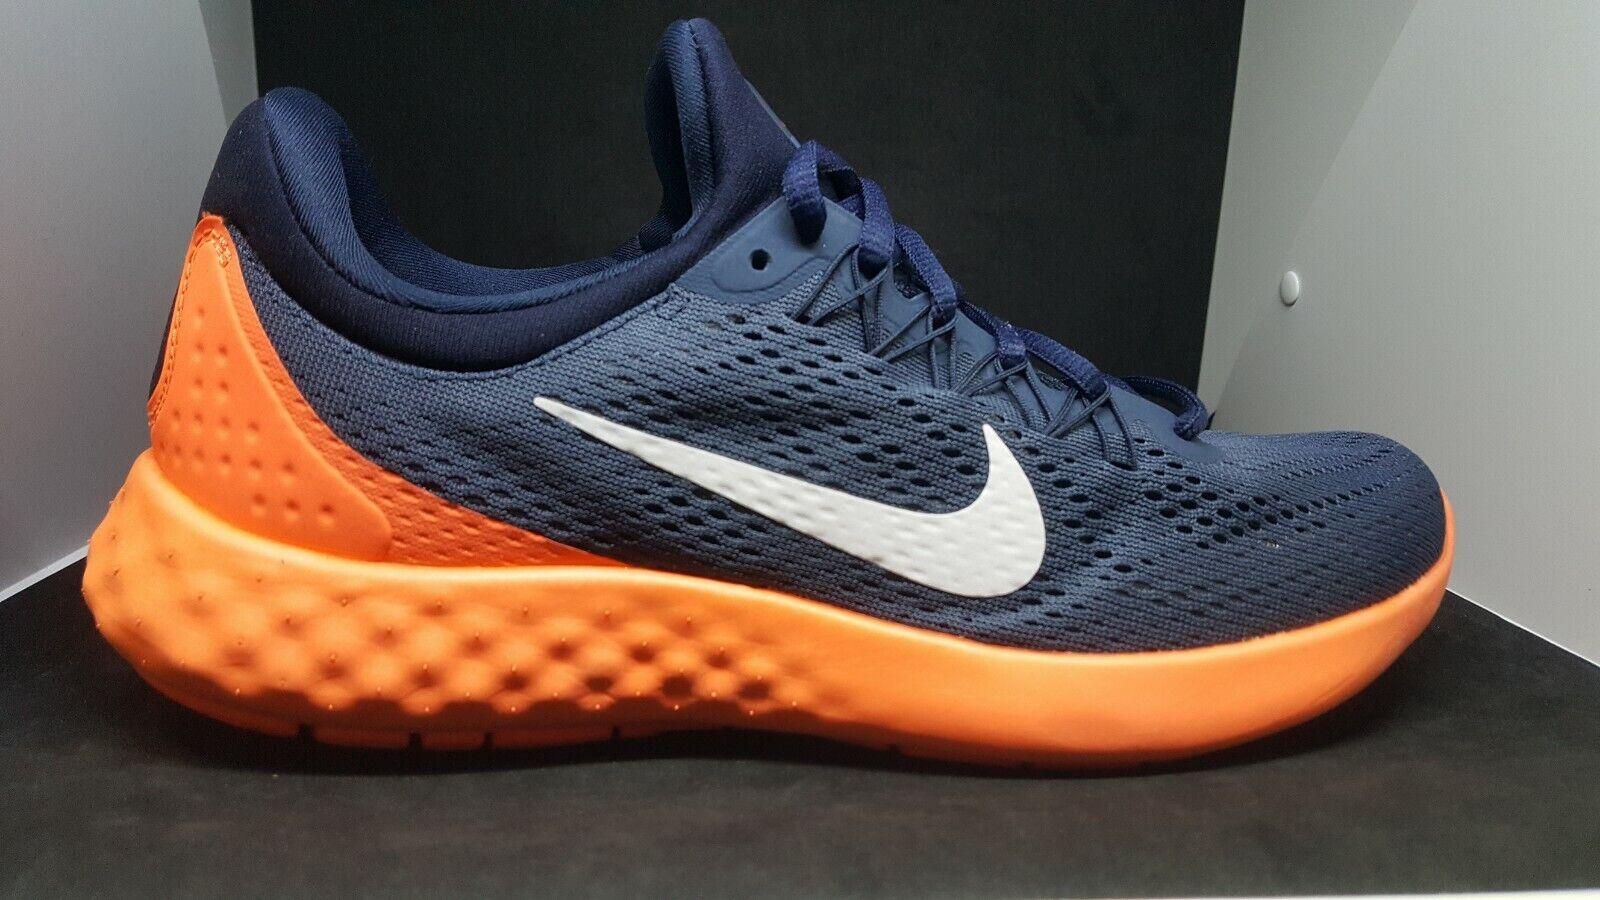 huge selection of 08035 0311c Nike Mens Lunar Skylelux Run Running shoes 855808-401 Size 8.5 8.5 8.5  4b4b81